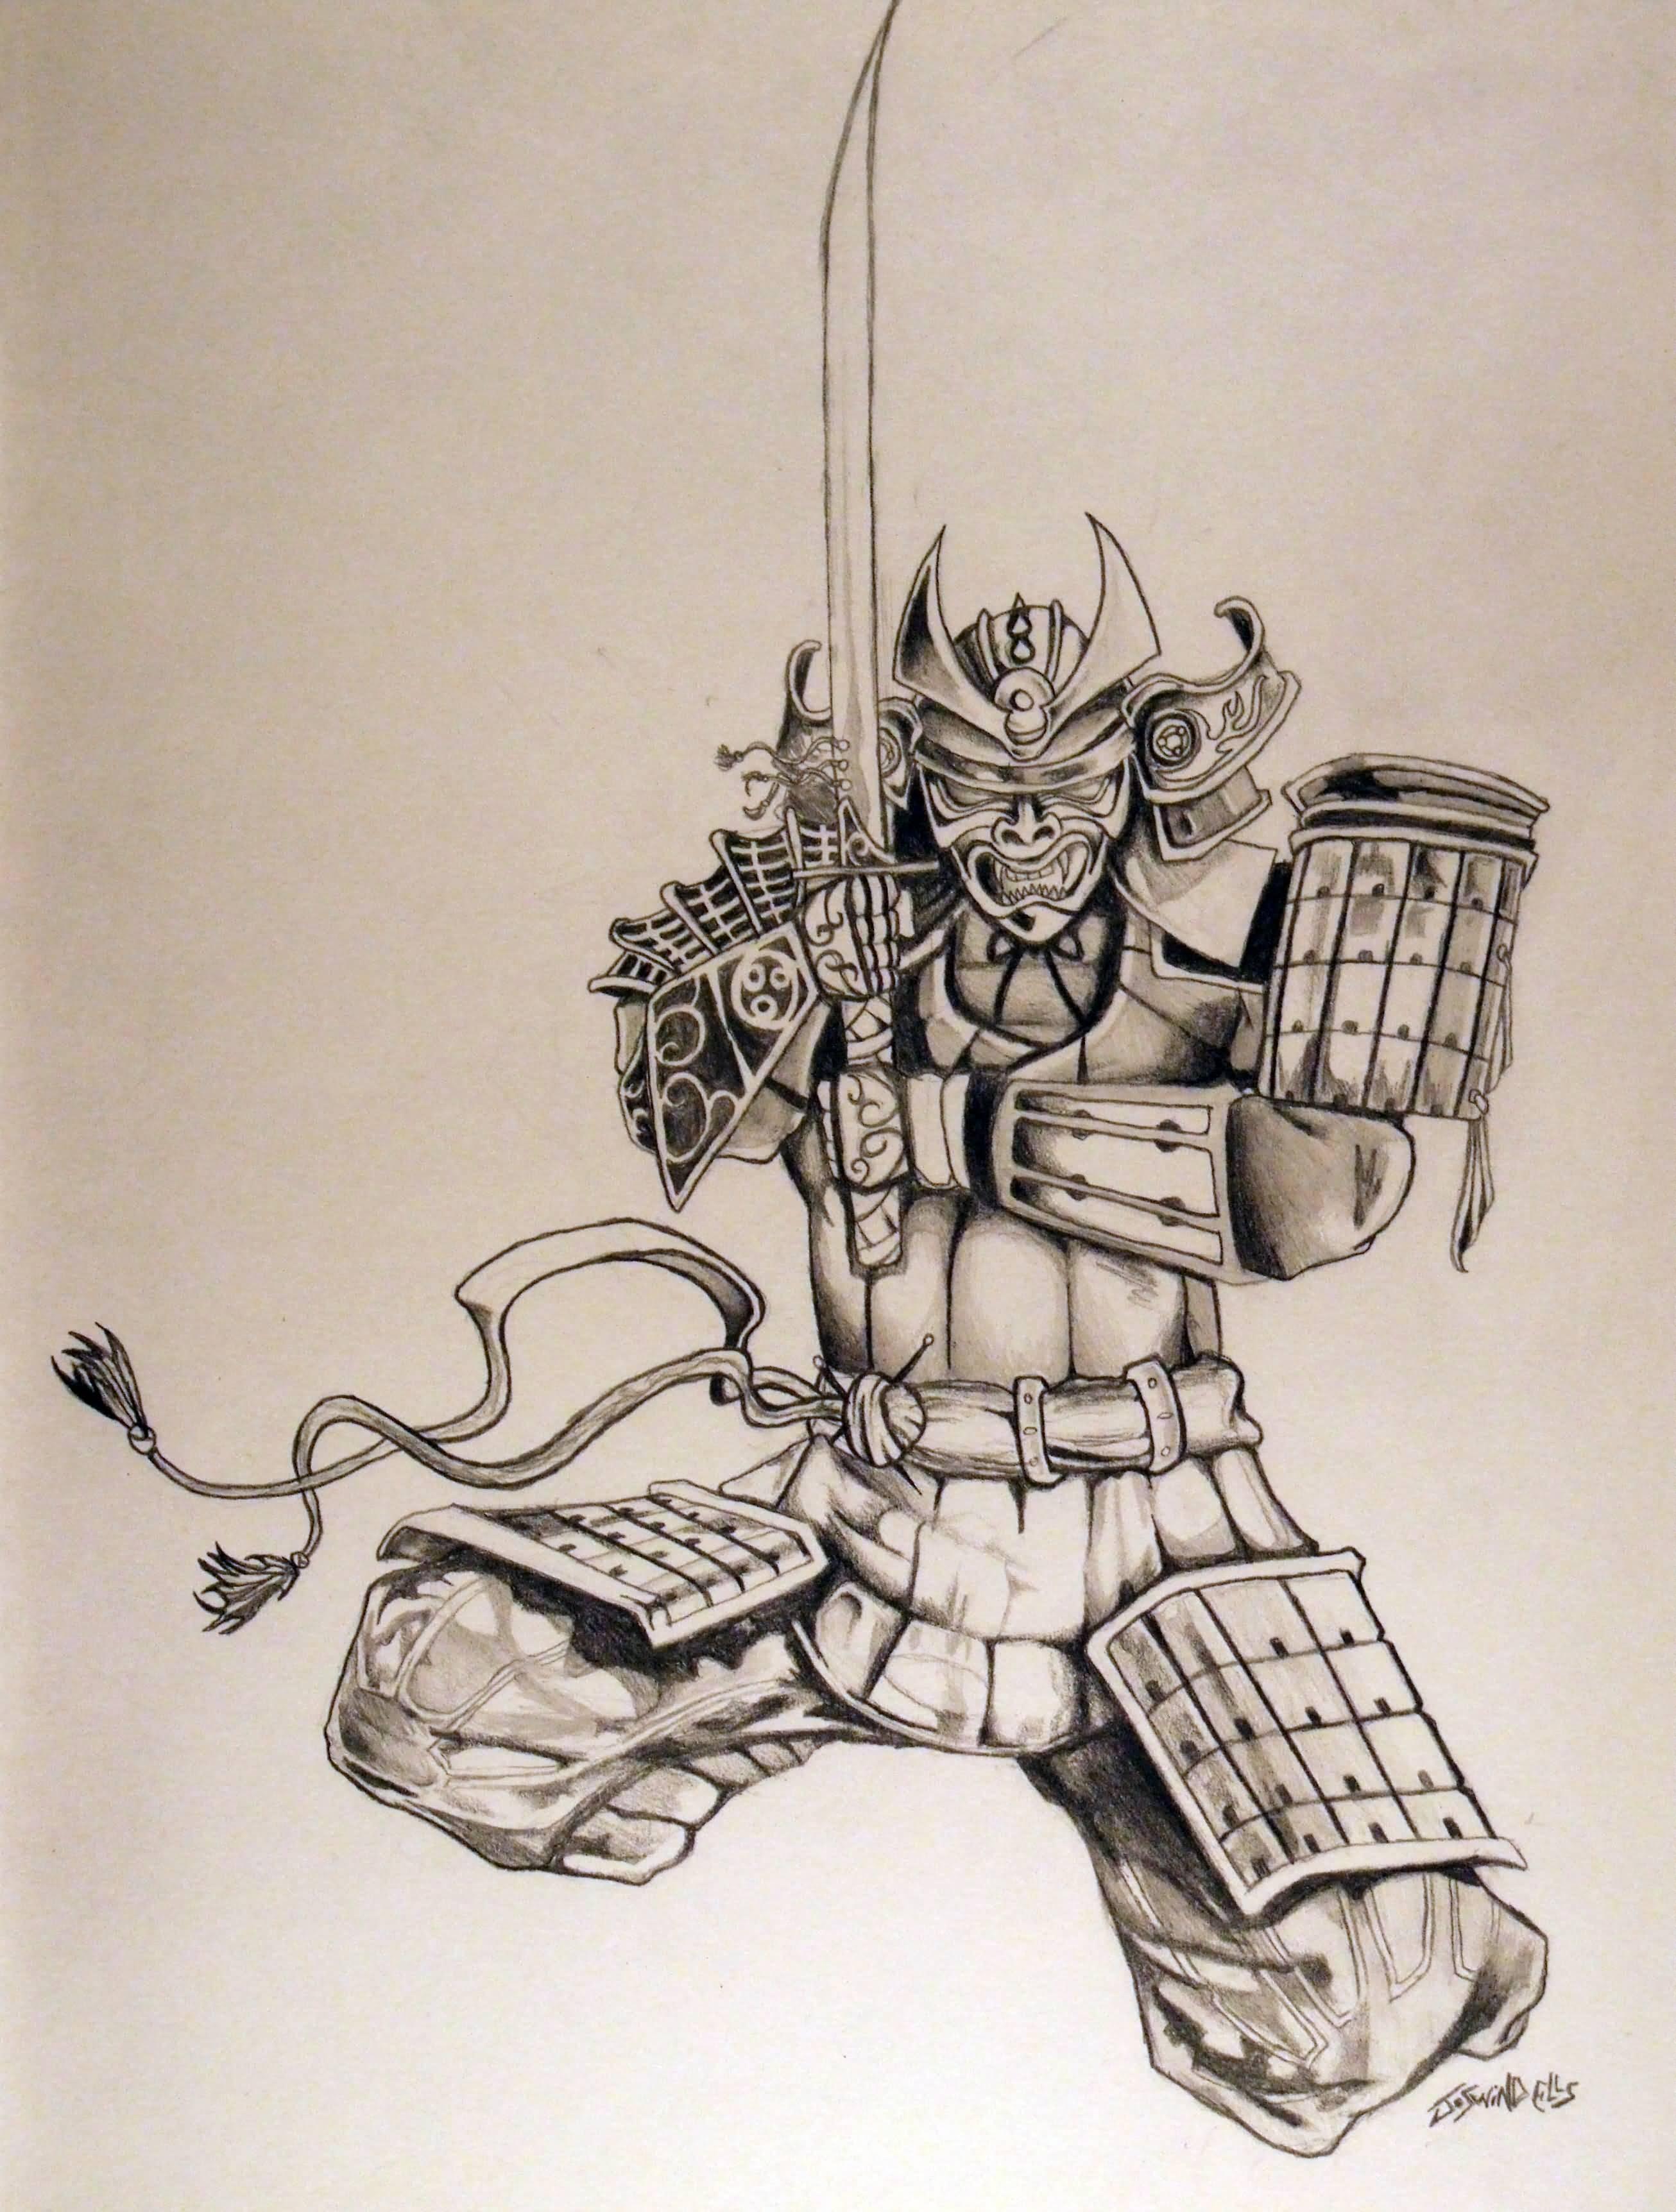 50 samurai warriors tattoos ideas and meanings. Black Bedroom Furniture Sets. Home Design Ideas